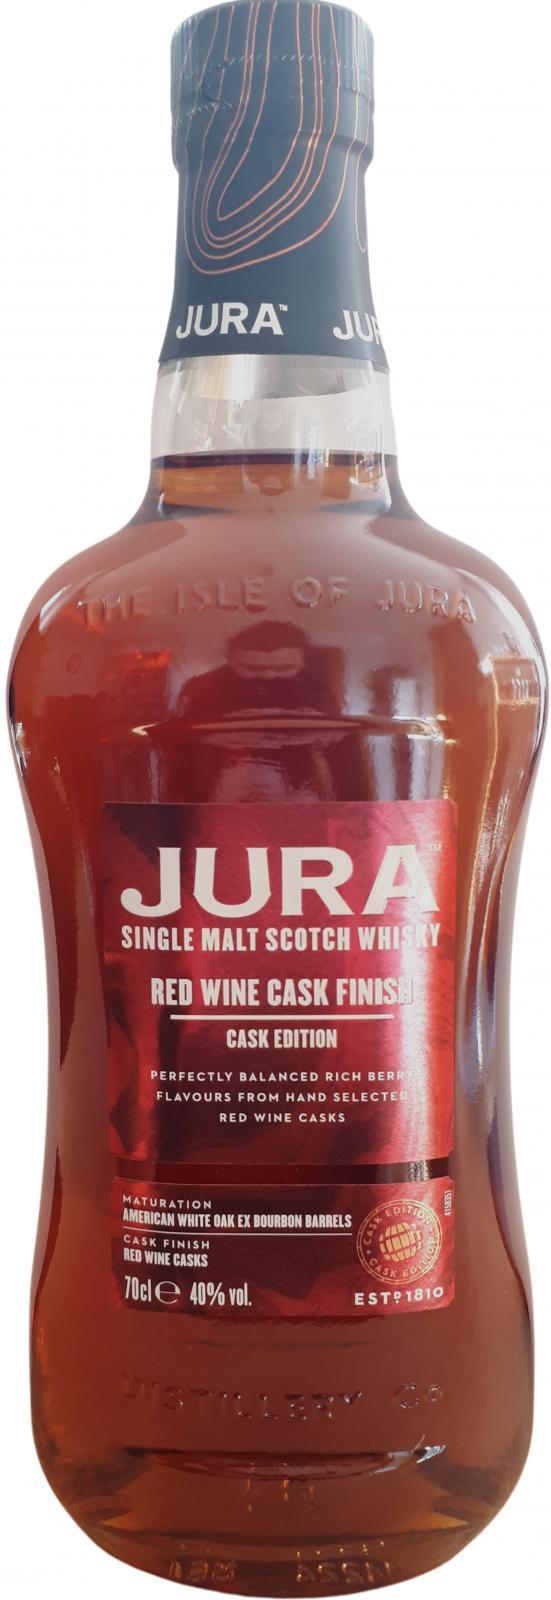 Isle of Jura Red Wine Cask Finish